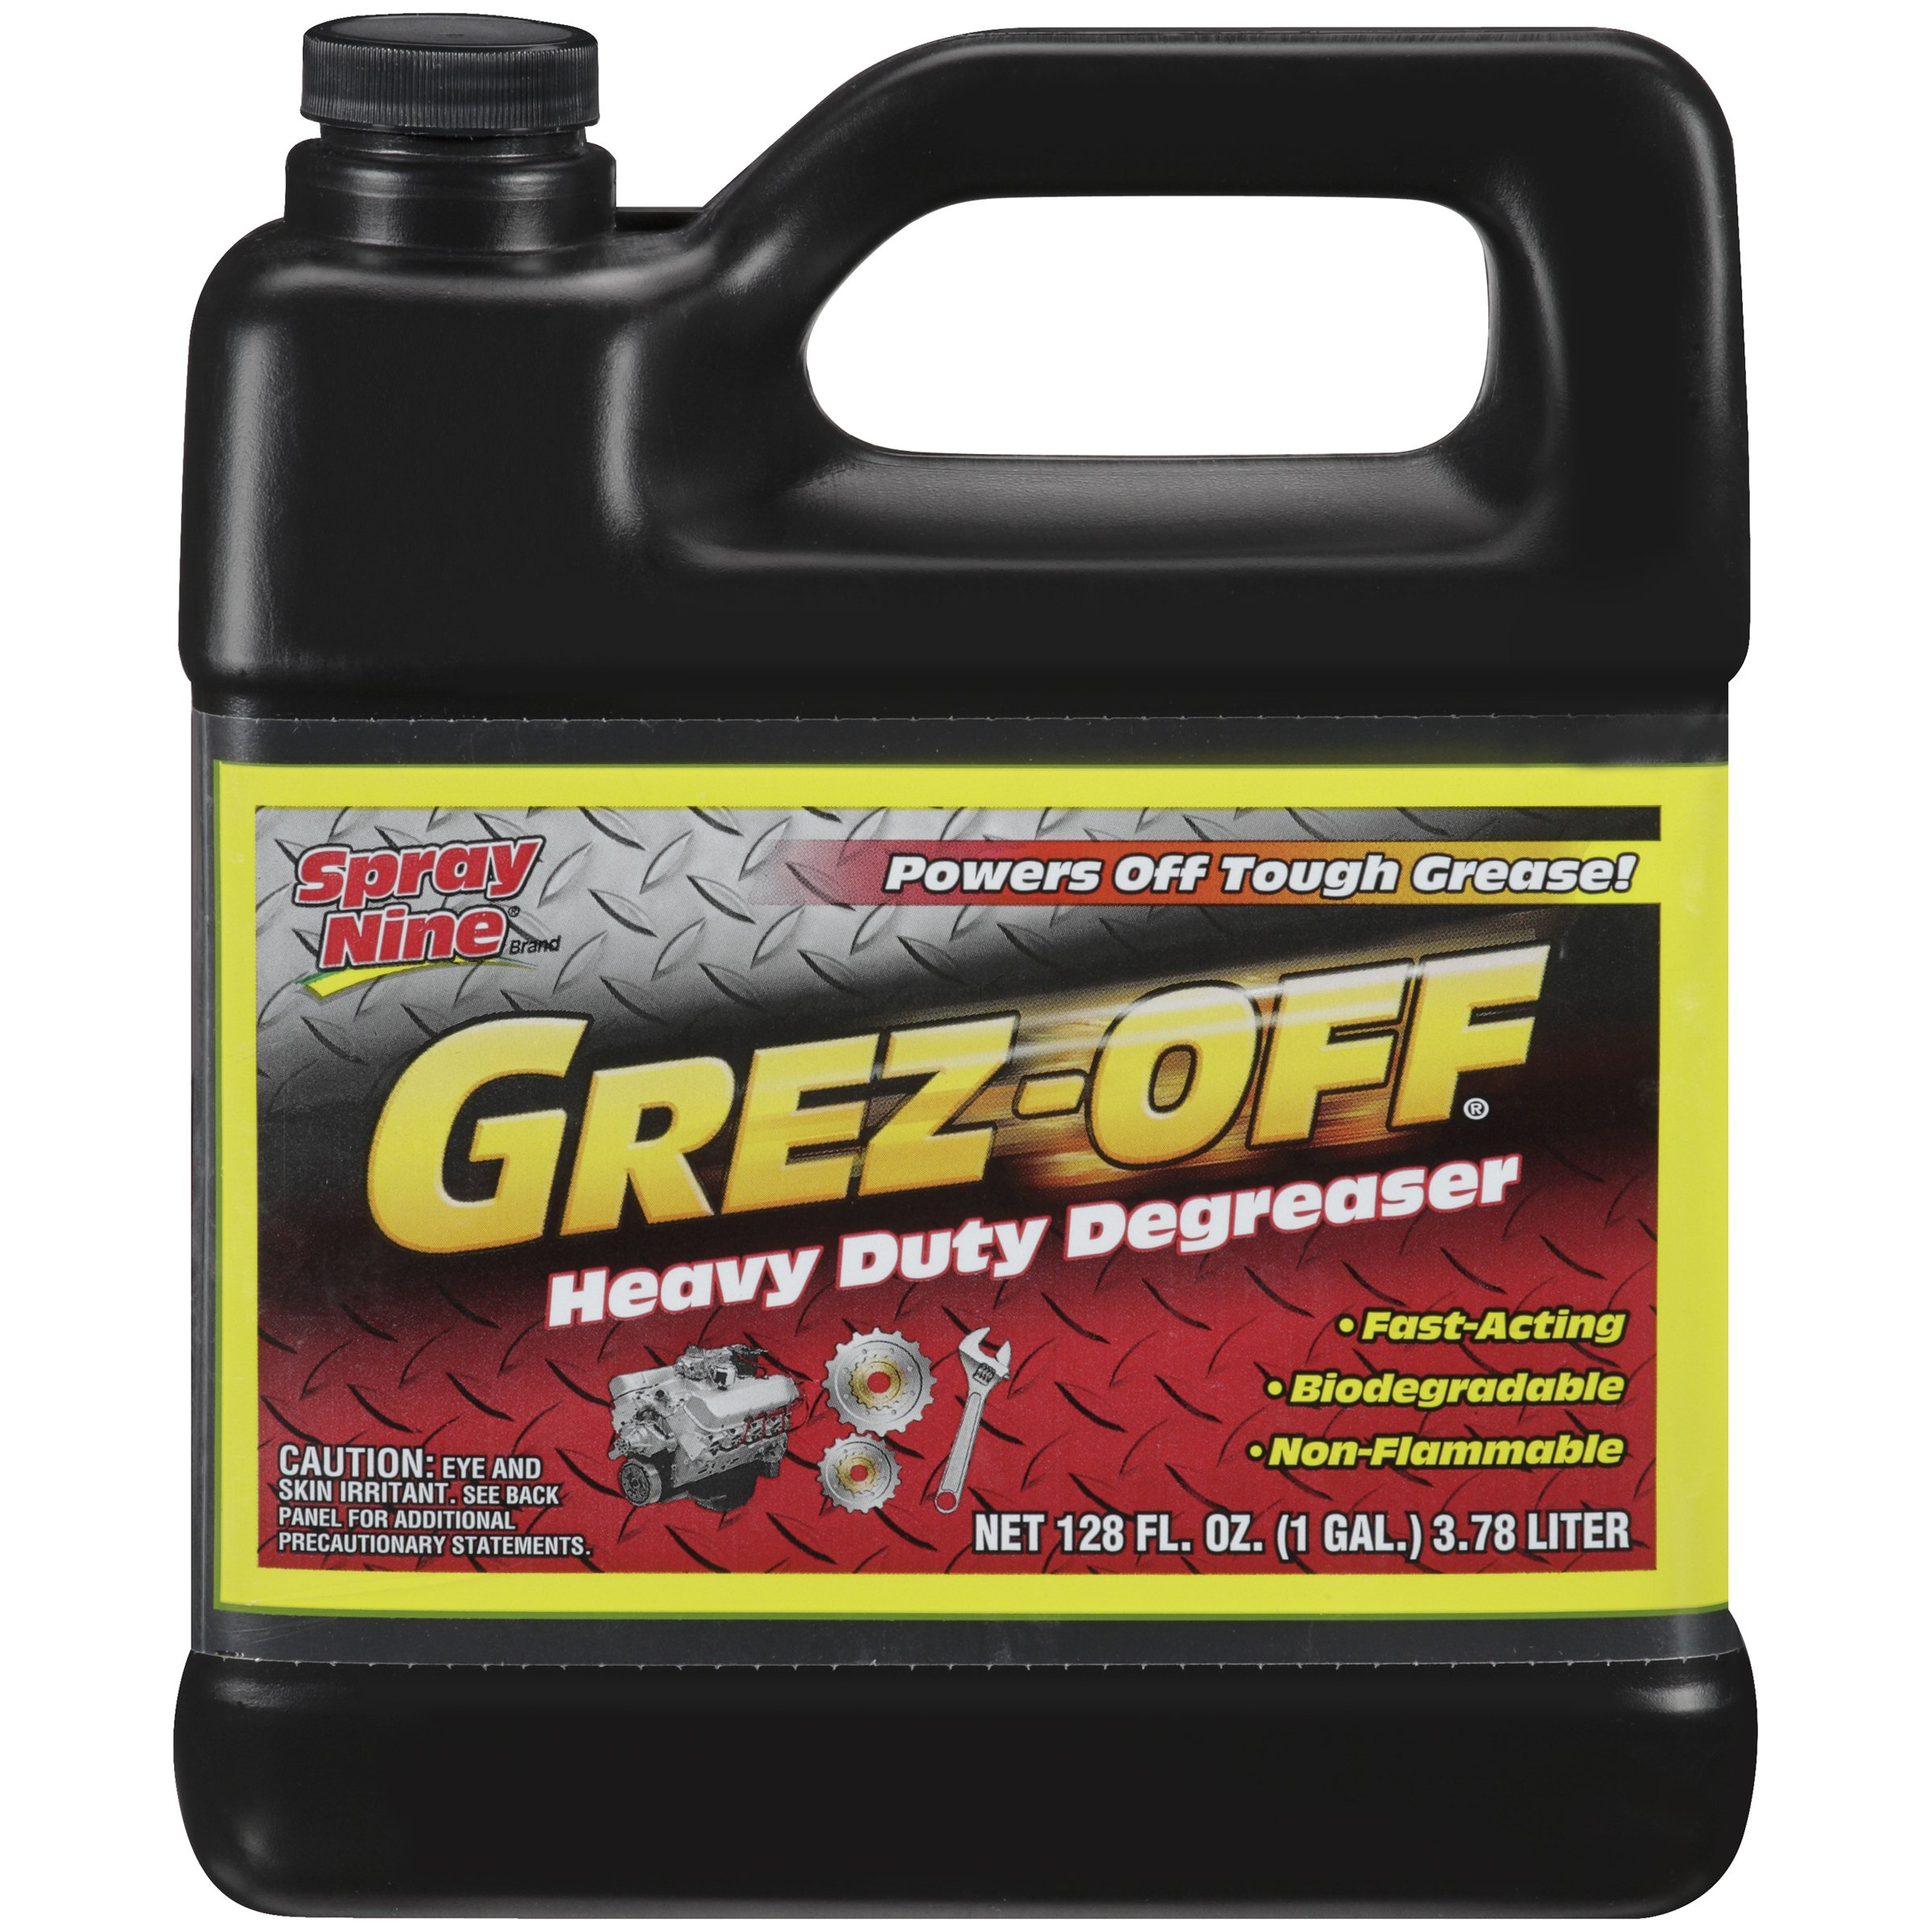 Spray Nine 22701 Grez-Off Heavy Duty Degreaser, 1 Gallon by Spray Nine